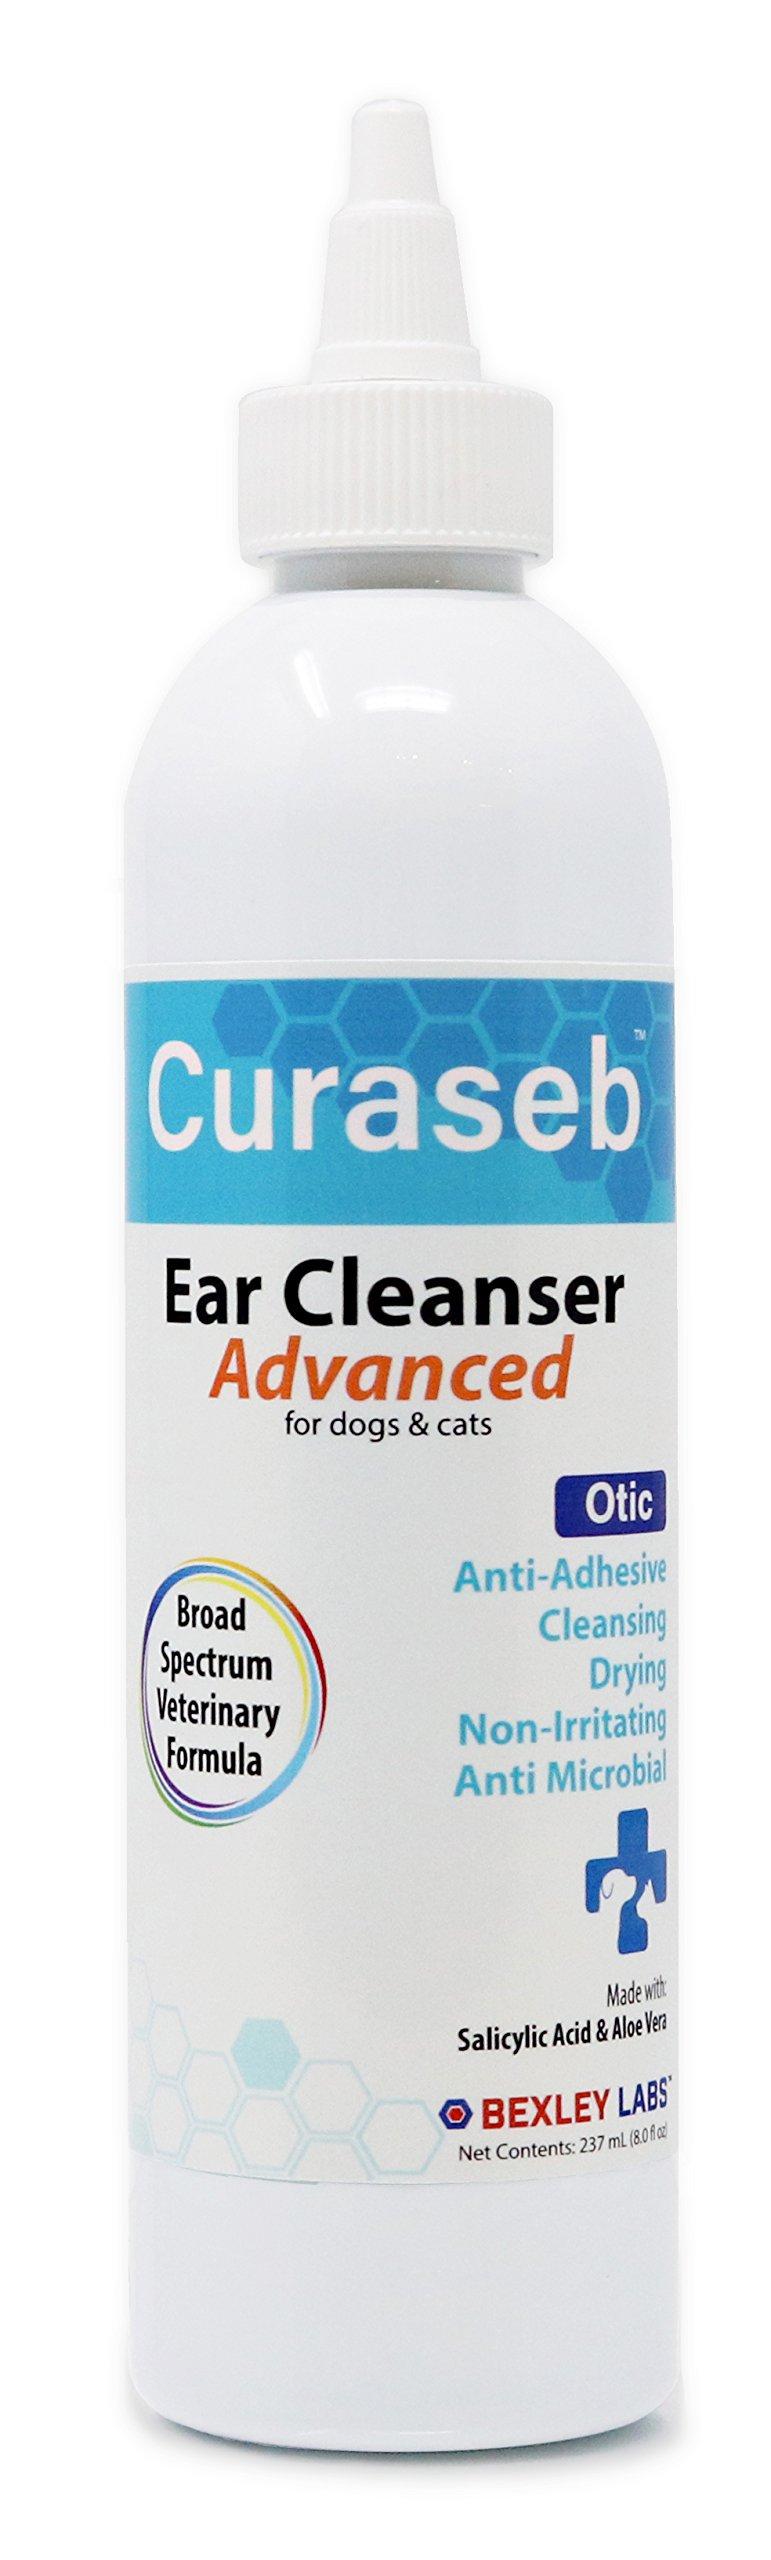 Bexley Labs Curaseb | #1 Vet Otic Advanced Dog & Cat Ear Cleaner, 8oz